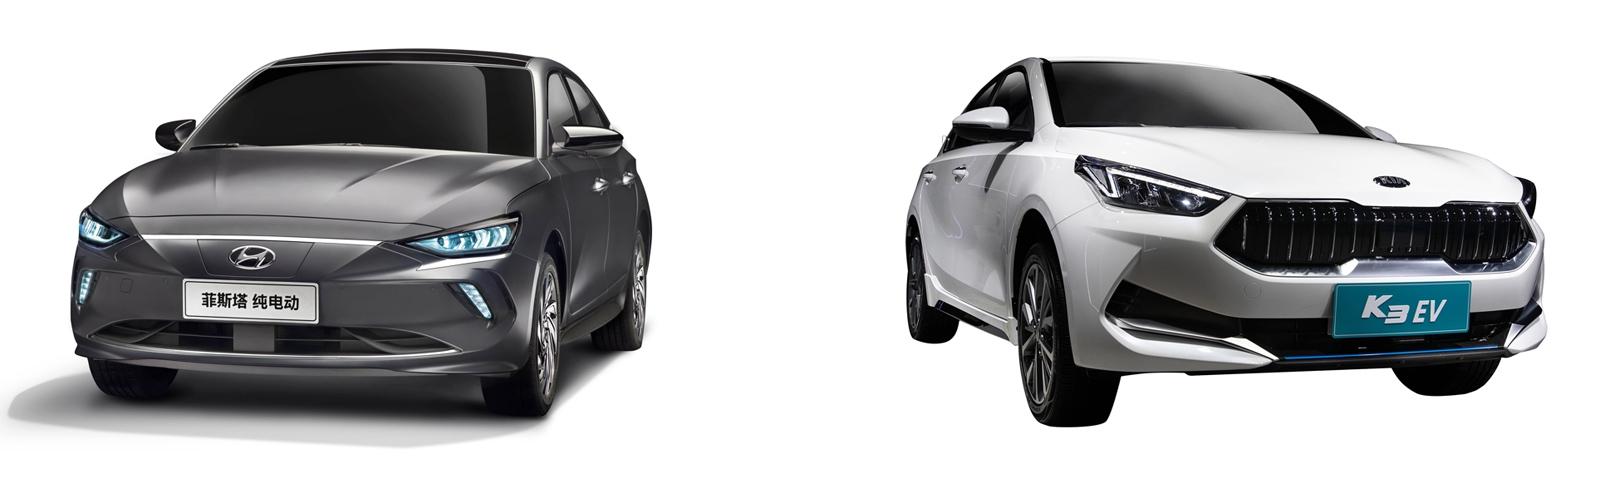 Hyundai Lafesta EV and Kia K3 EV will launch in China next year